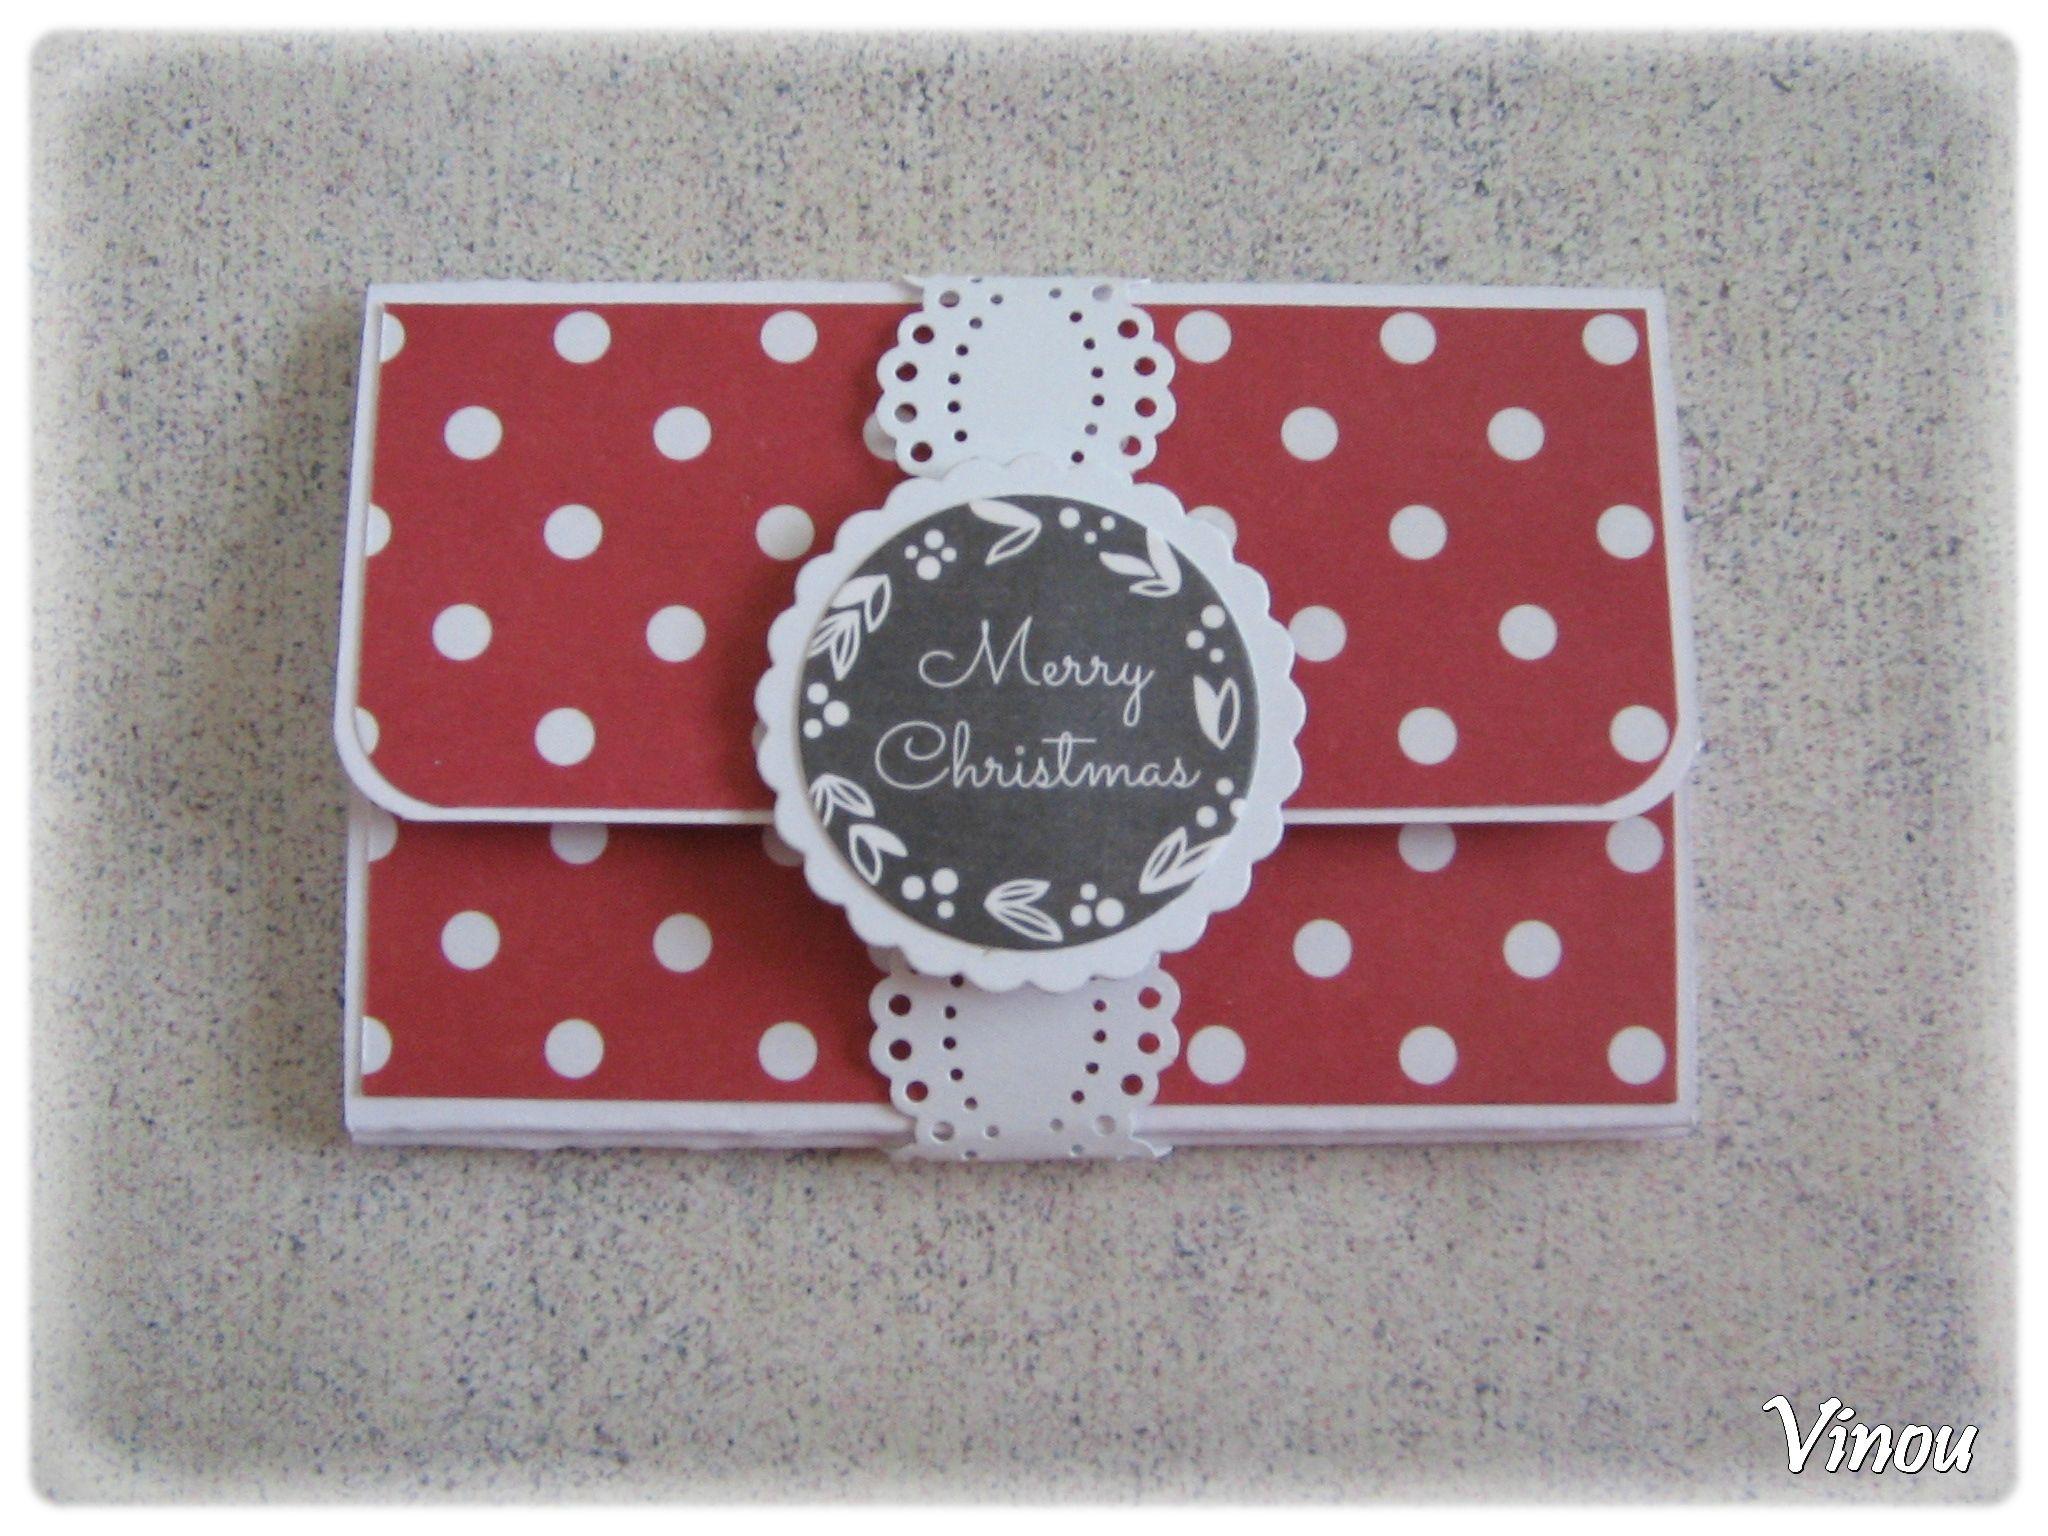 cartons noel jour 6 vinou creations scrapbooking pinterest carte noel pochette cadeau. Black Bedroom Furniture Sets. Home Design Ideas